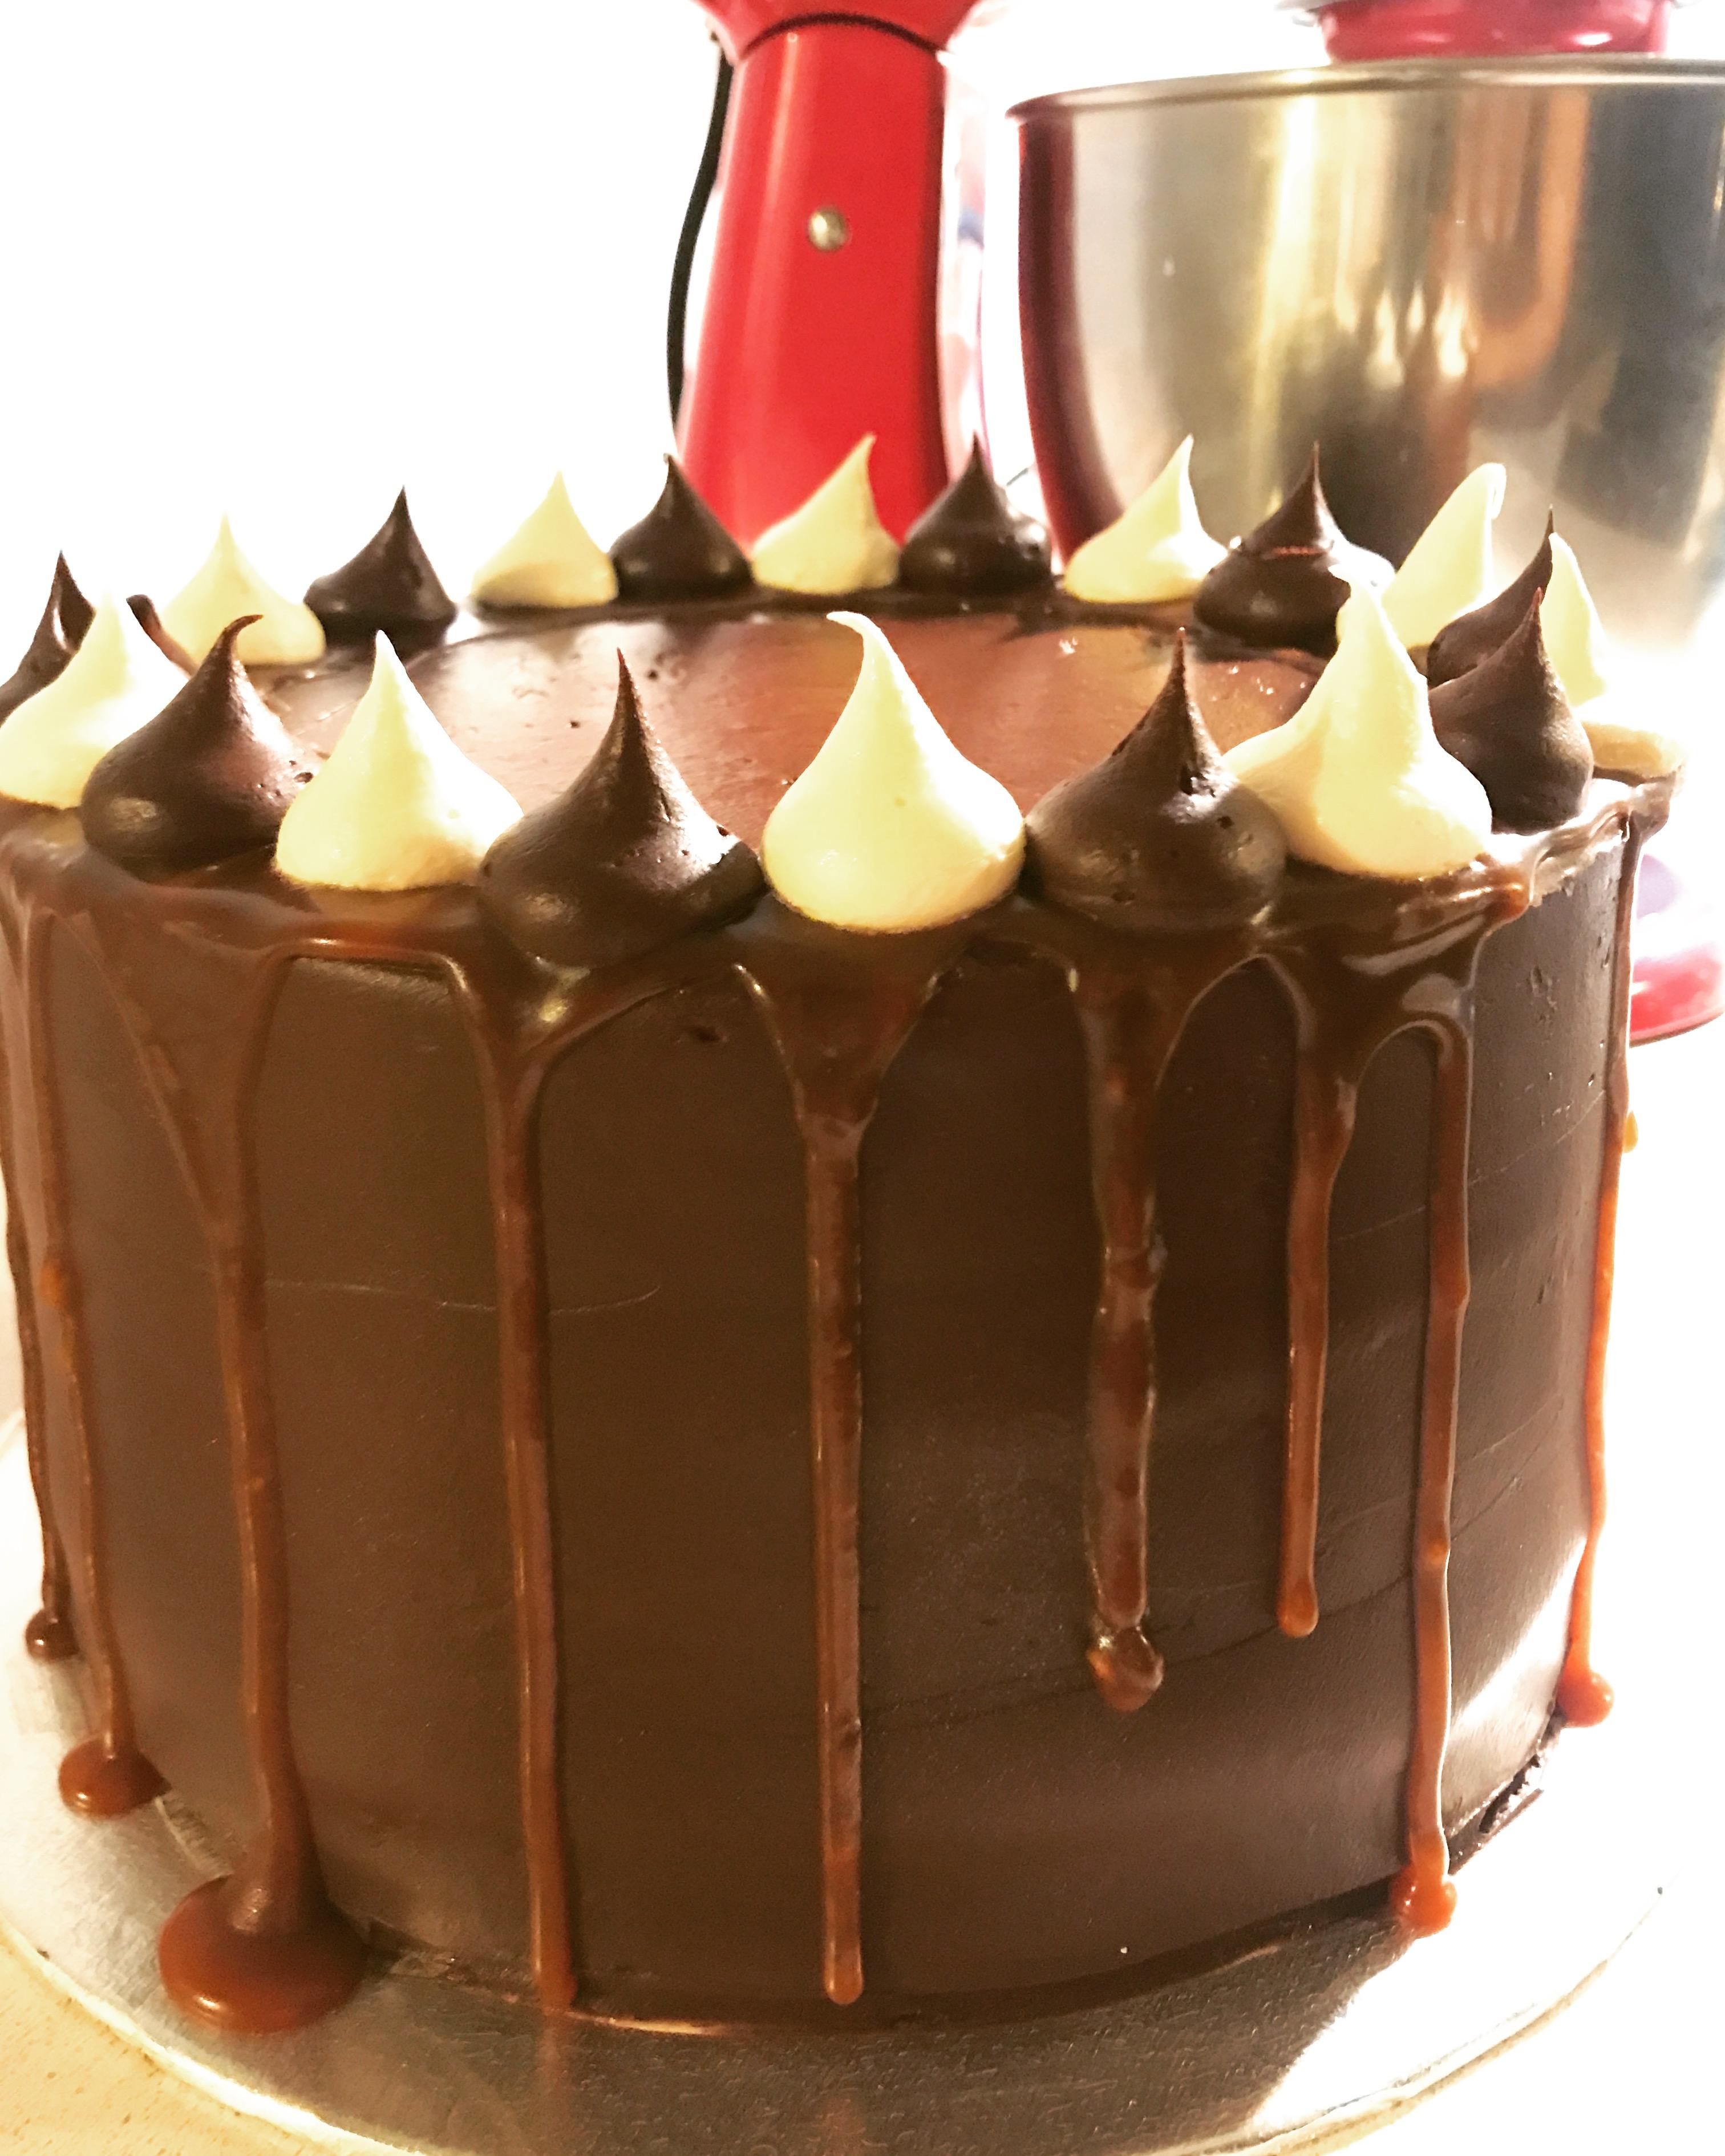 Chocolate Caramel Drip Cake